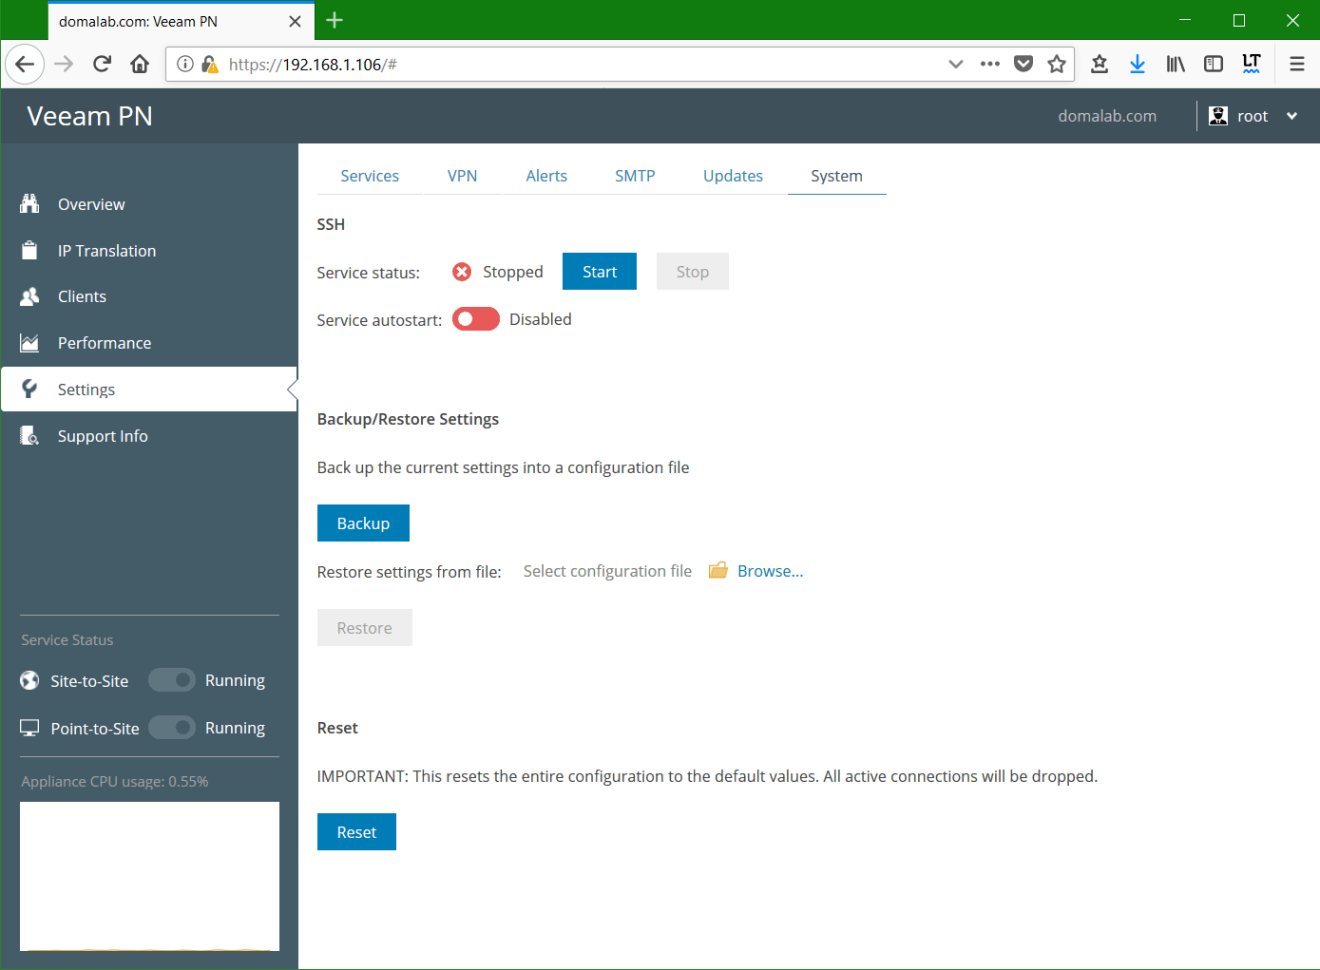 domalab.com Veeam PN system